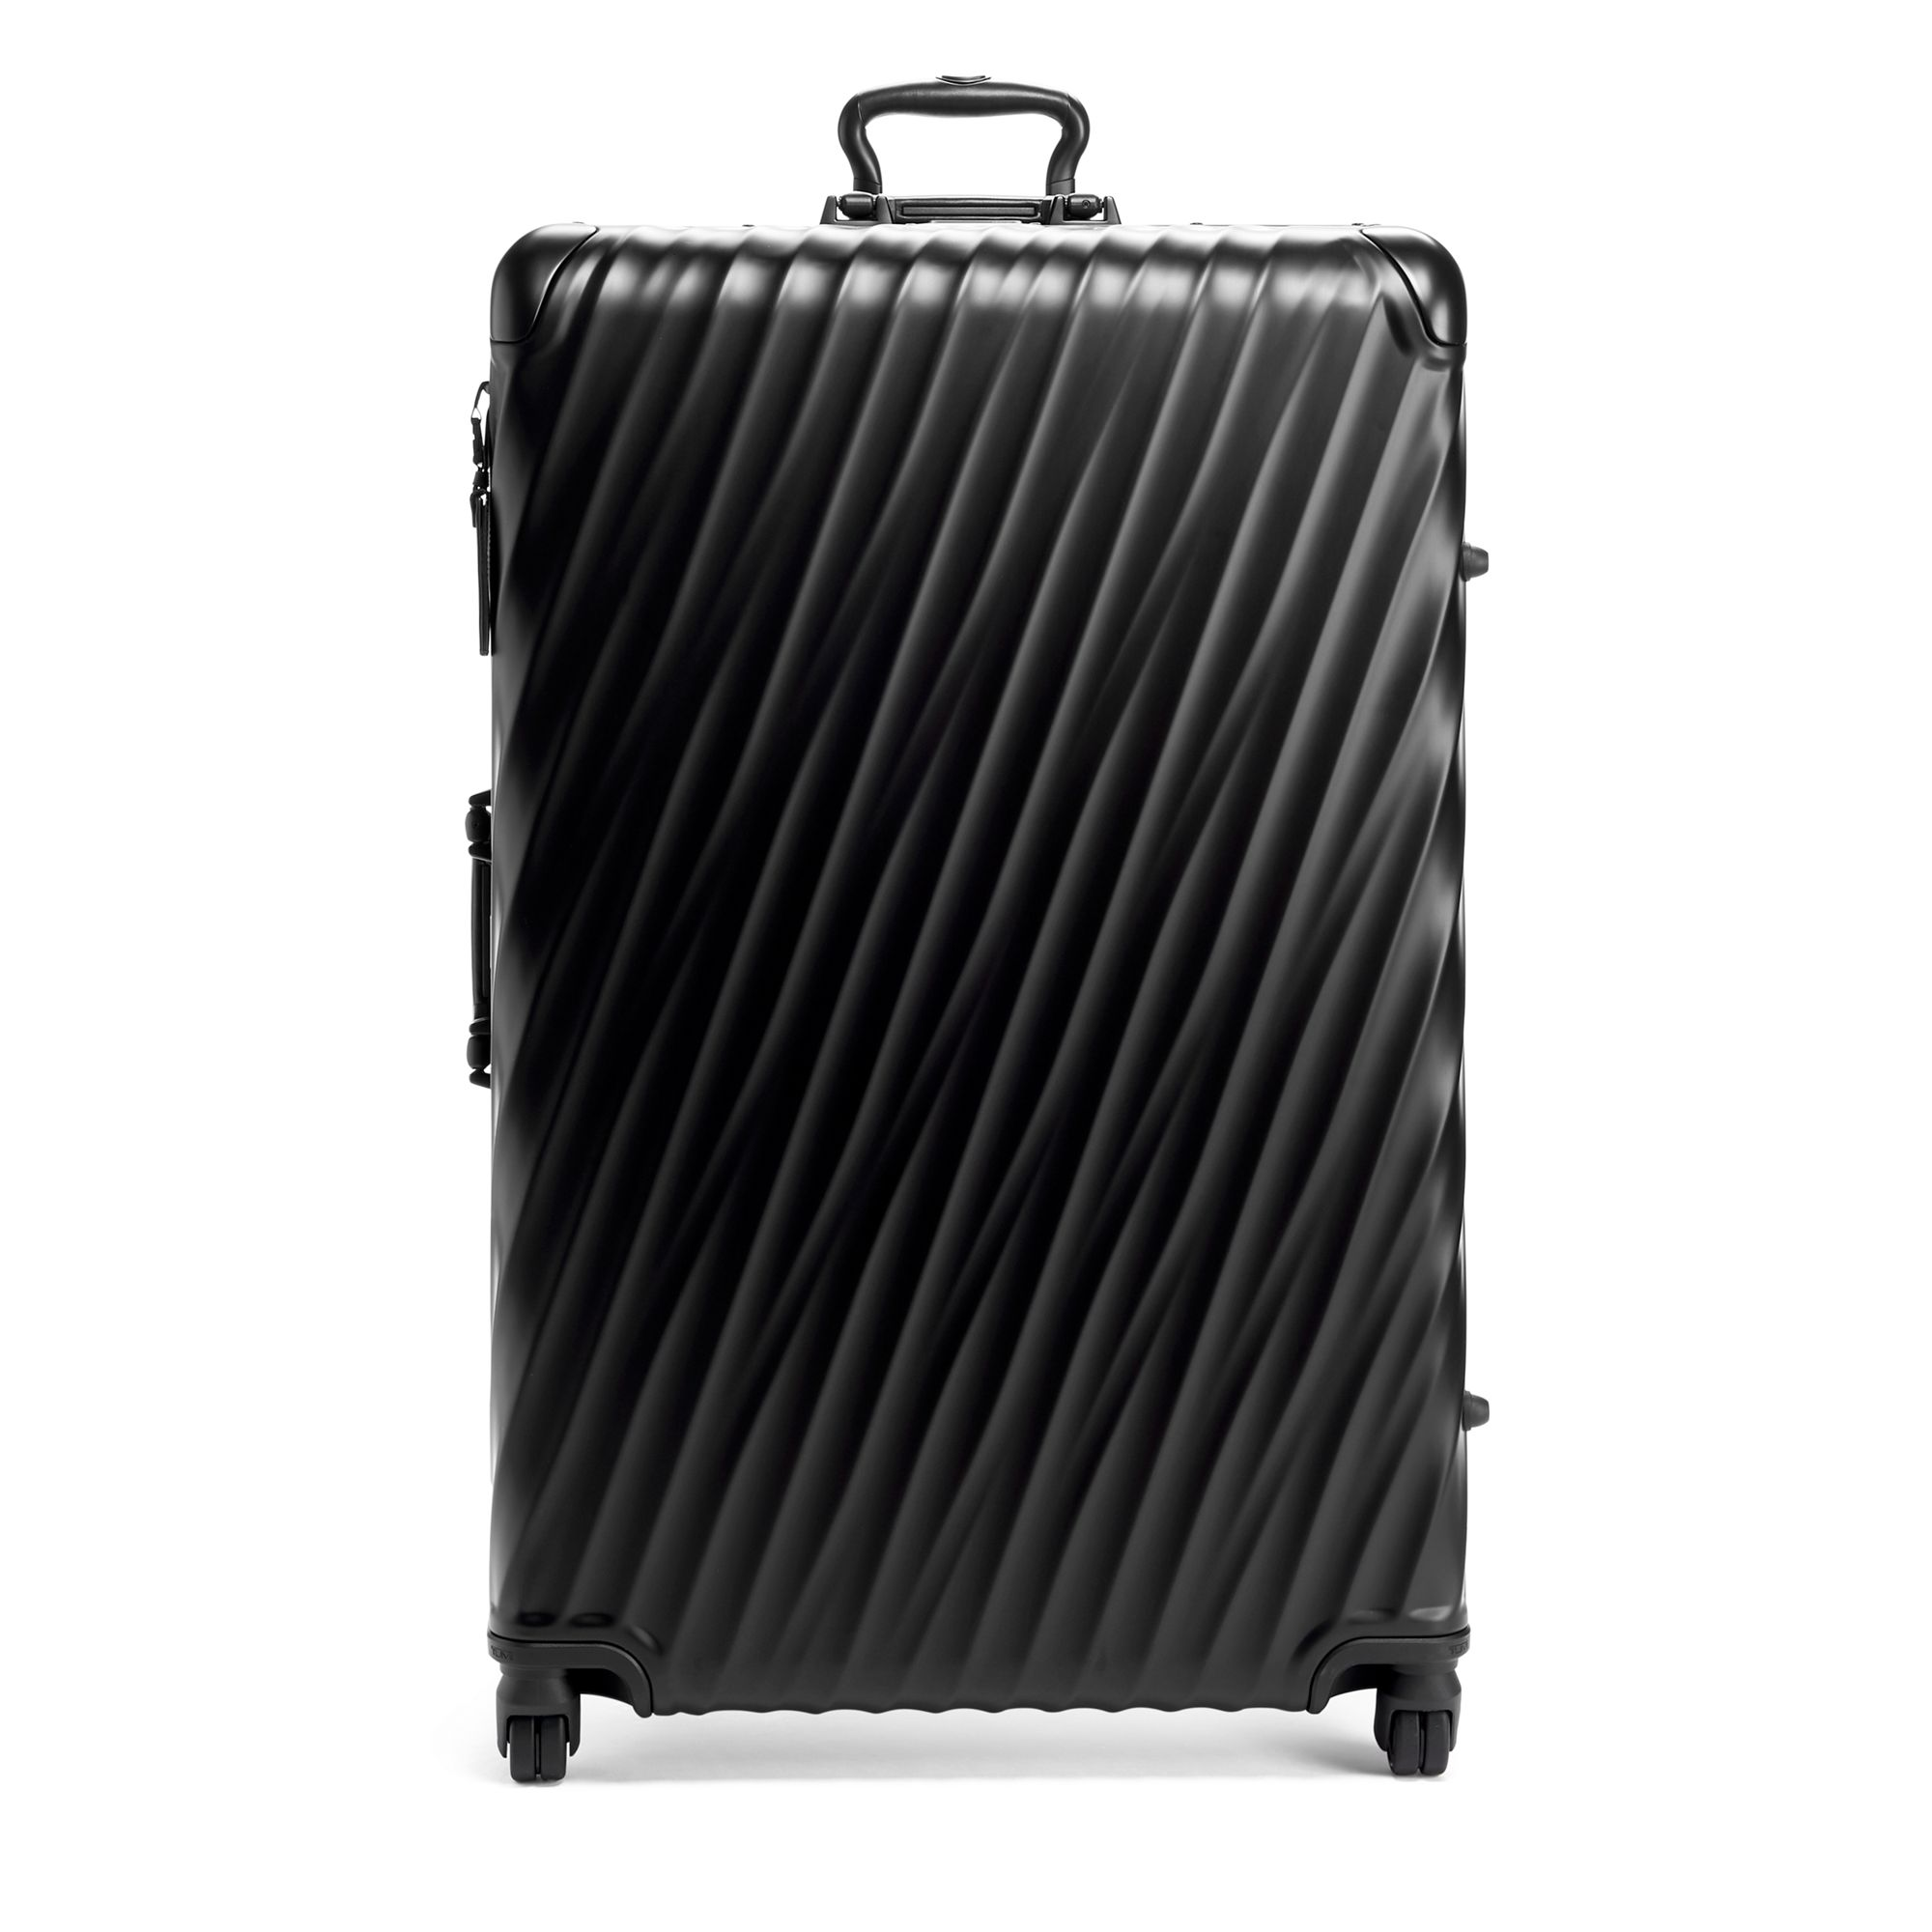 10306124b 19 Degree Aluminum Collection - Tumi United States